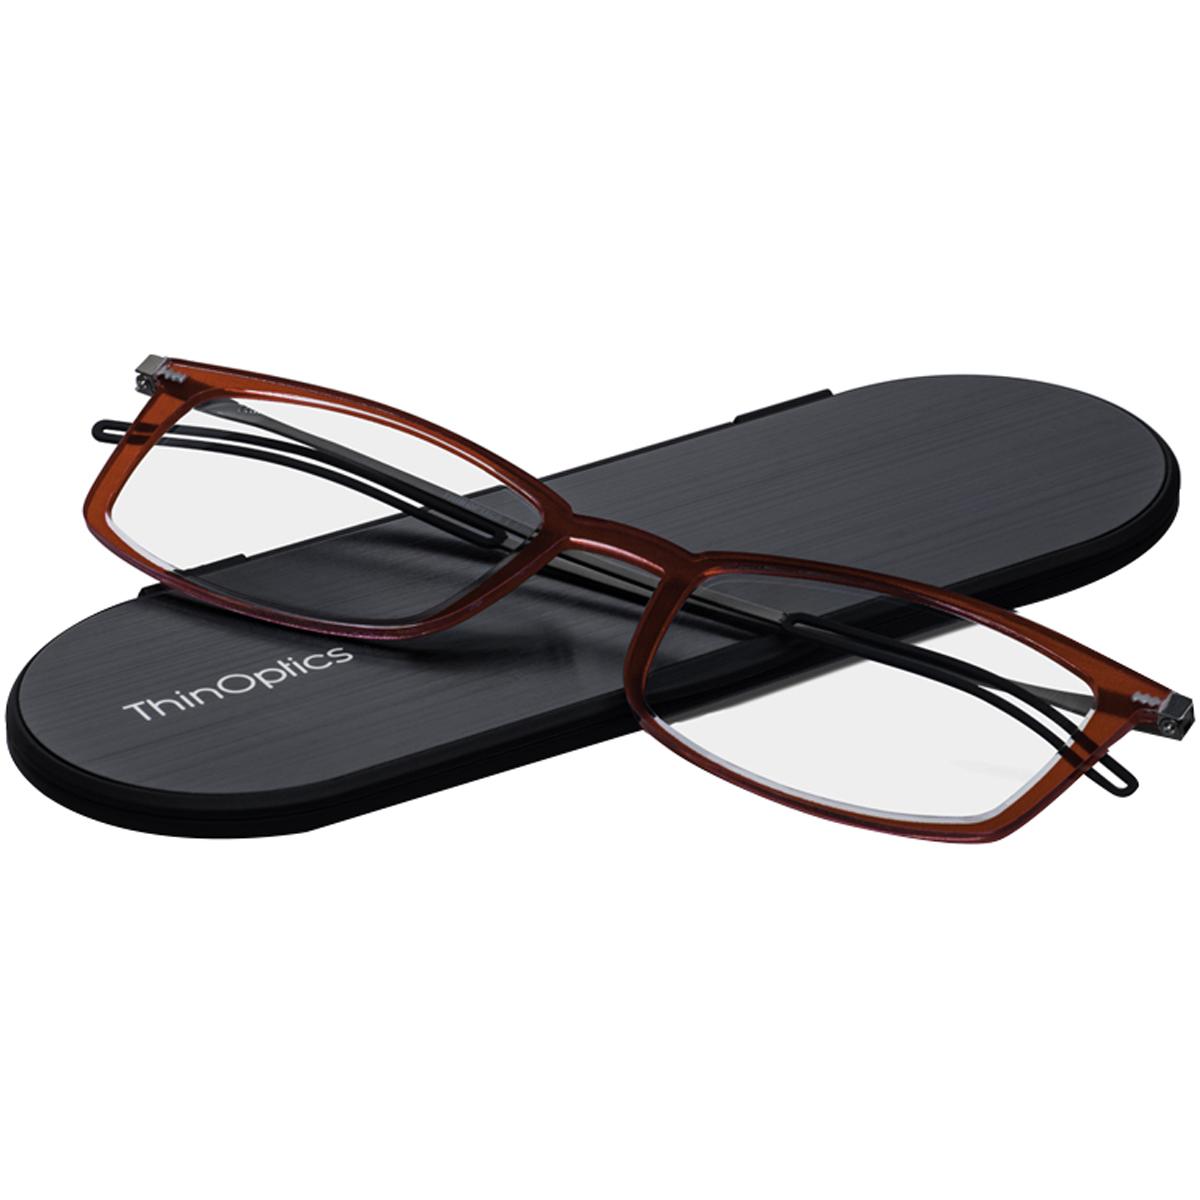 thumbnail 9 - ThinOptics FrontPage Brooklyn Reading Glasses with Milano Case